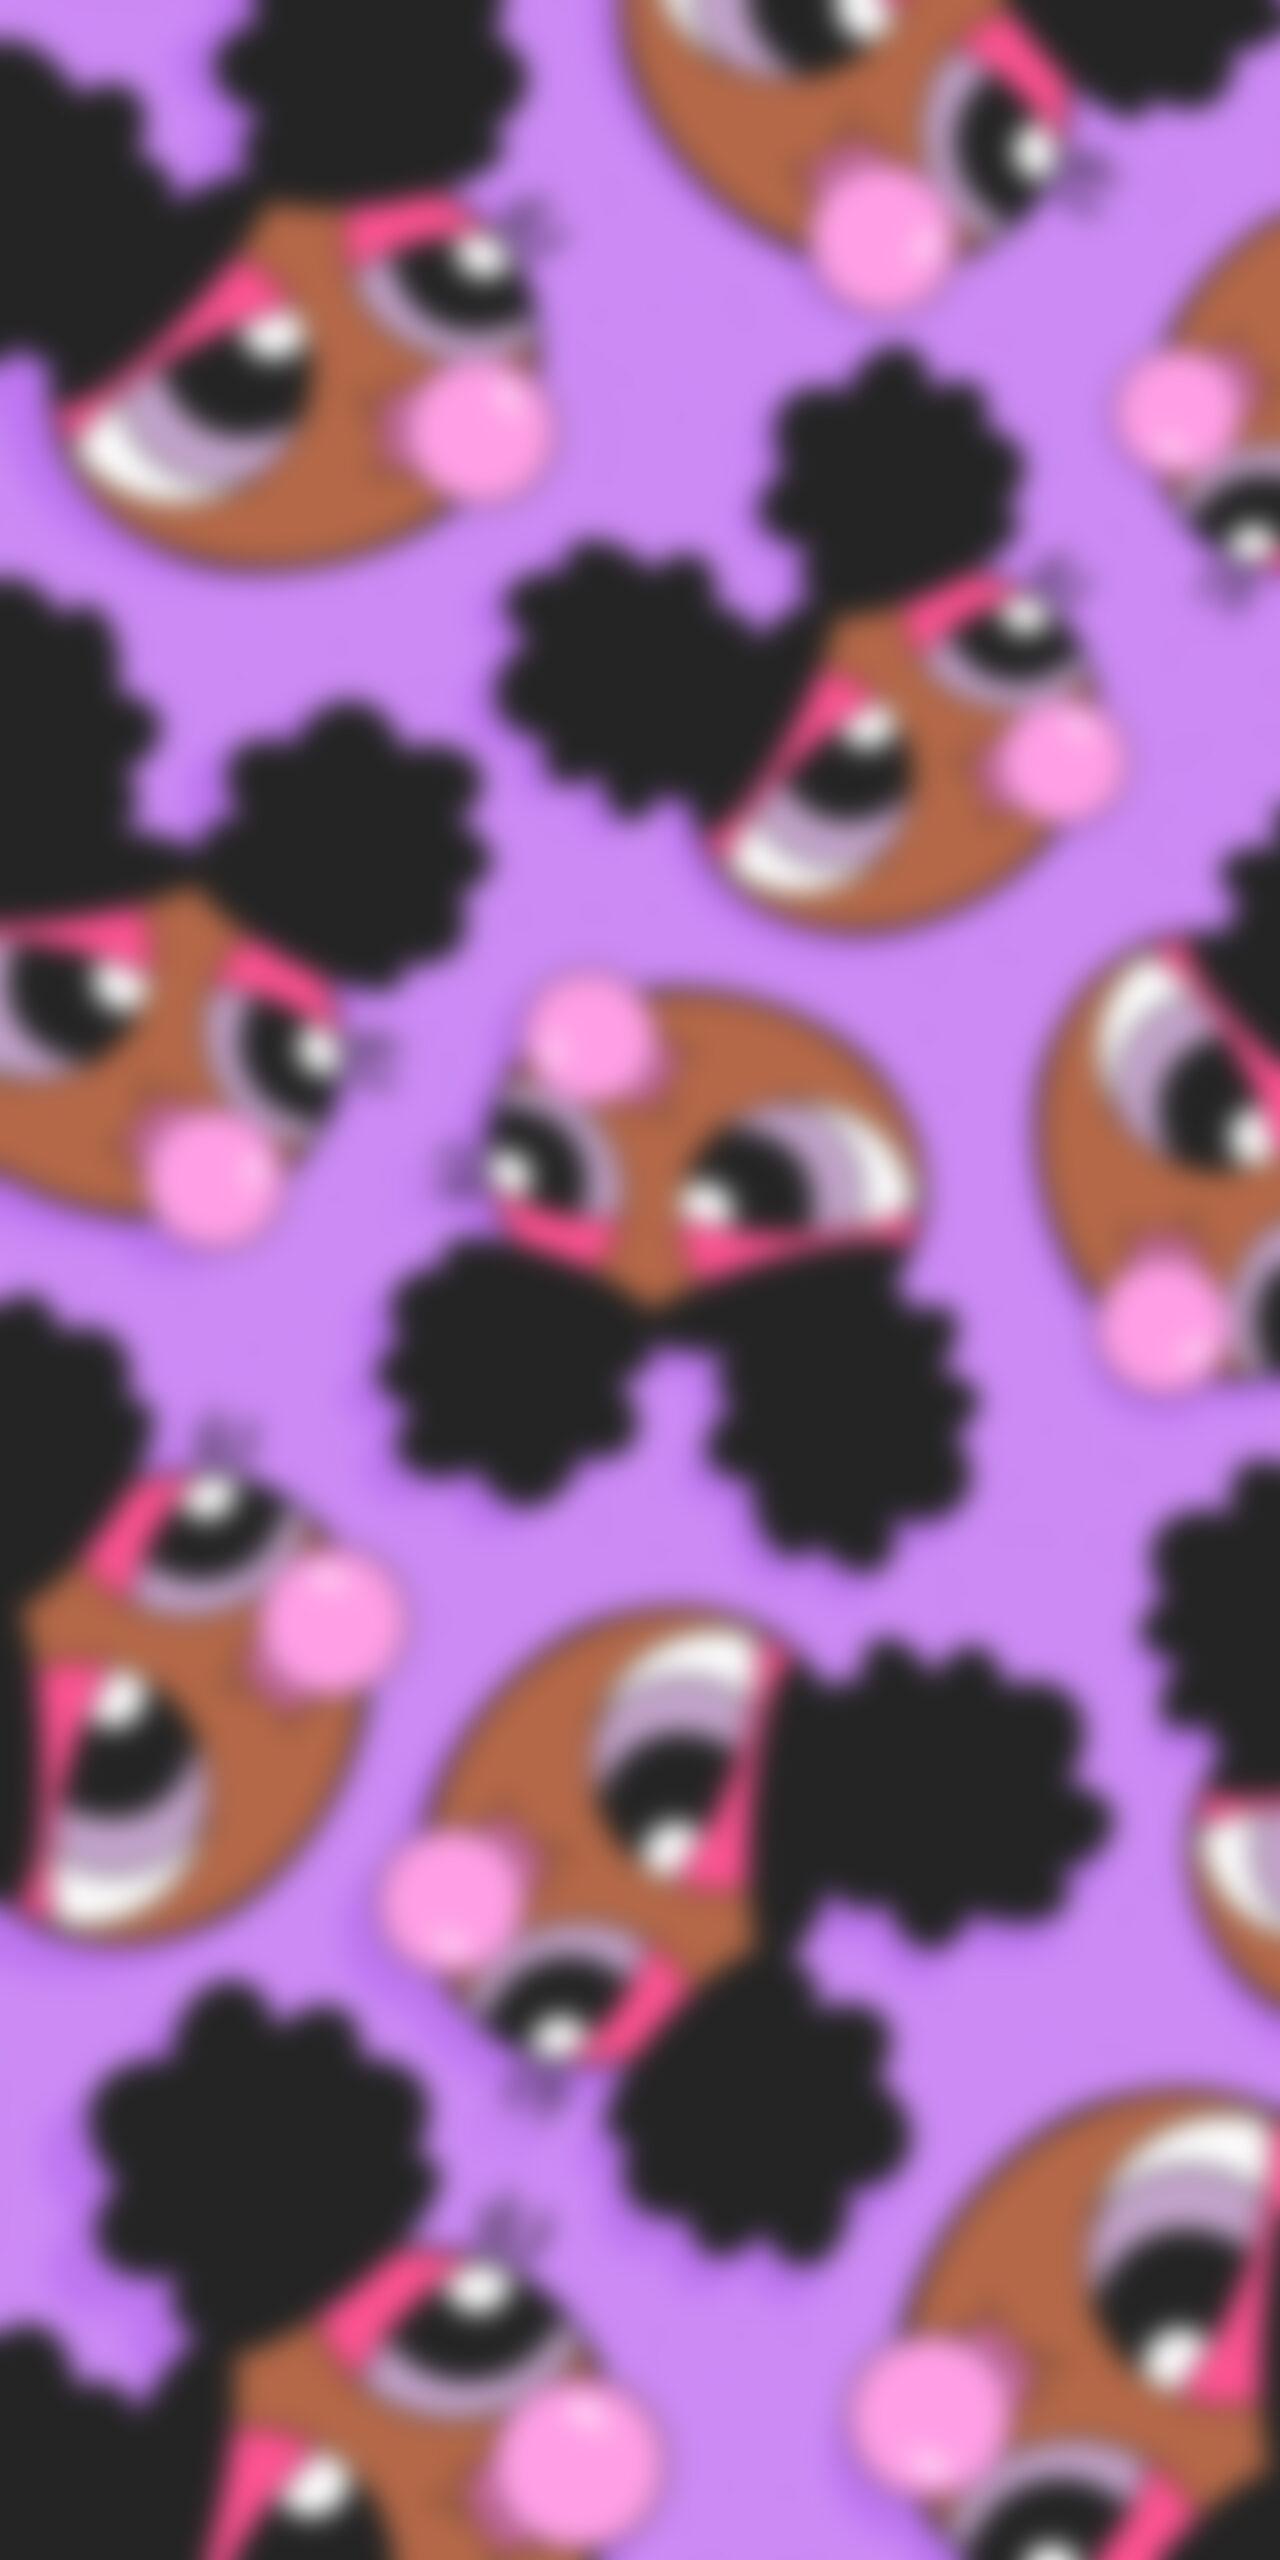 powerpuff girls bubblegum purple blur wallpaper